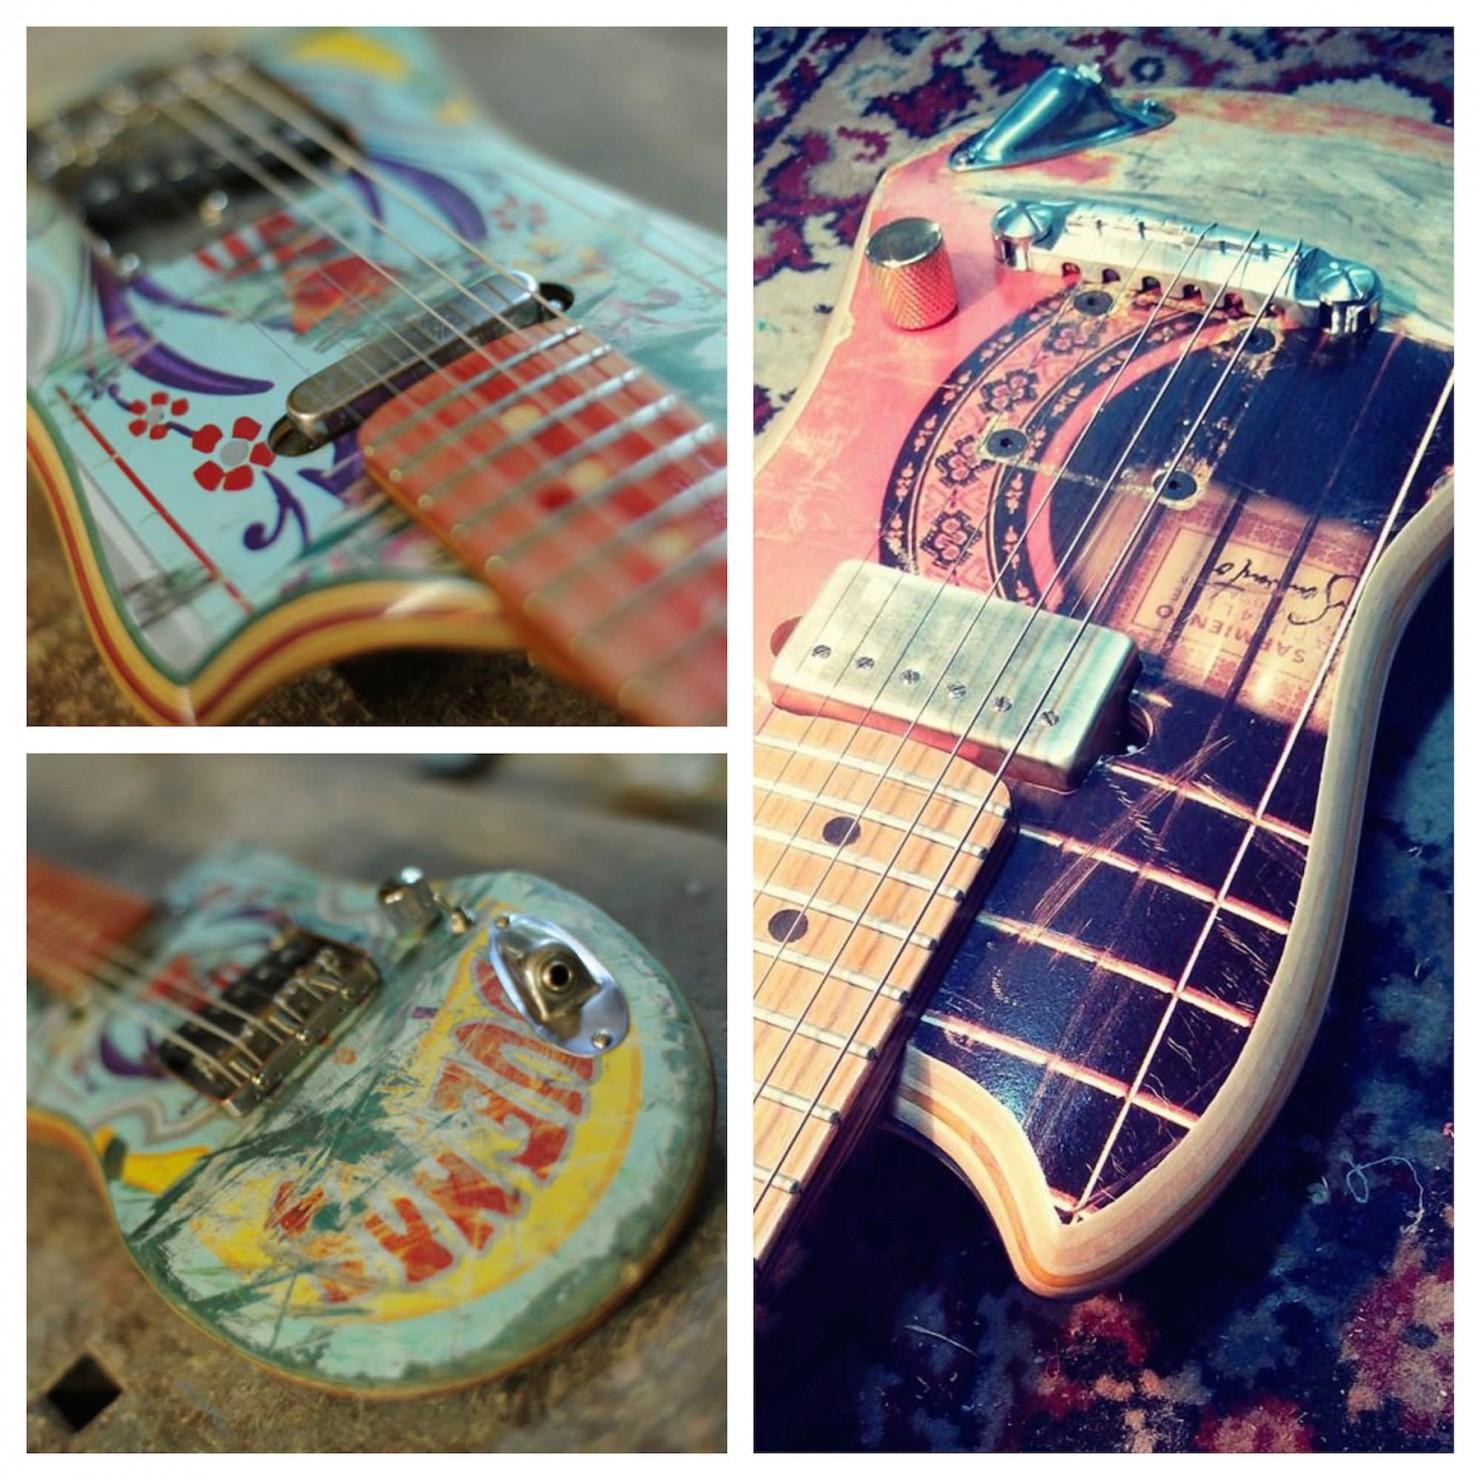 Skateboard_Guitars_1_Fotor_Collage_2-1480x1480